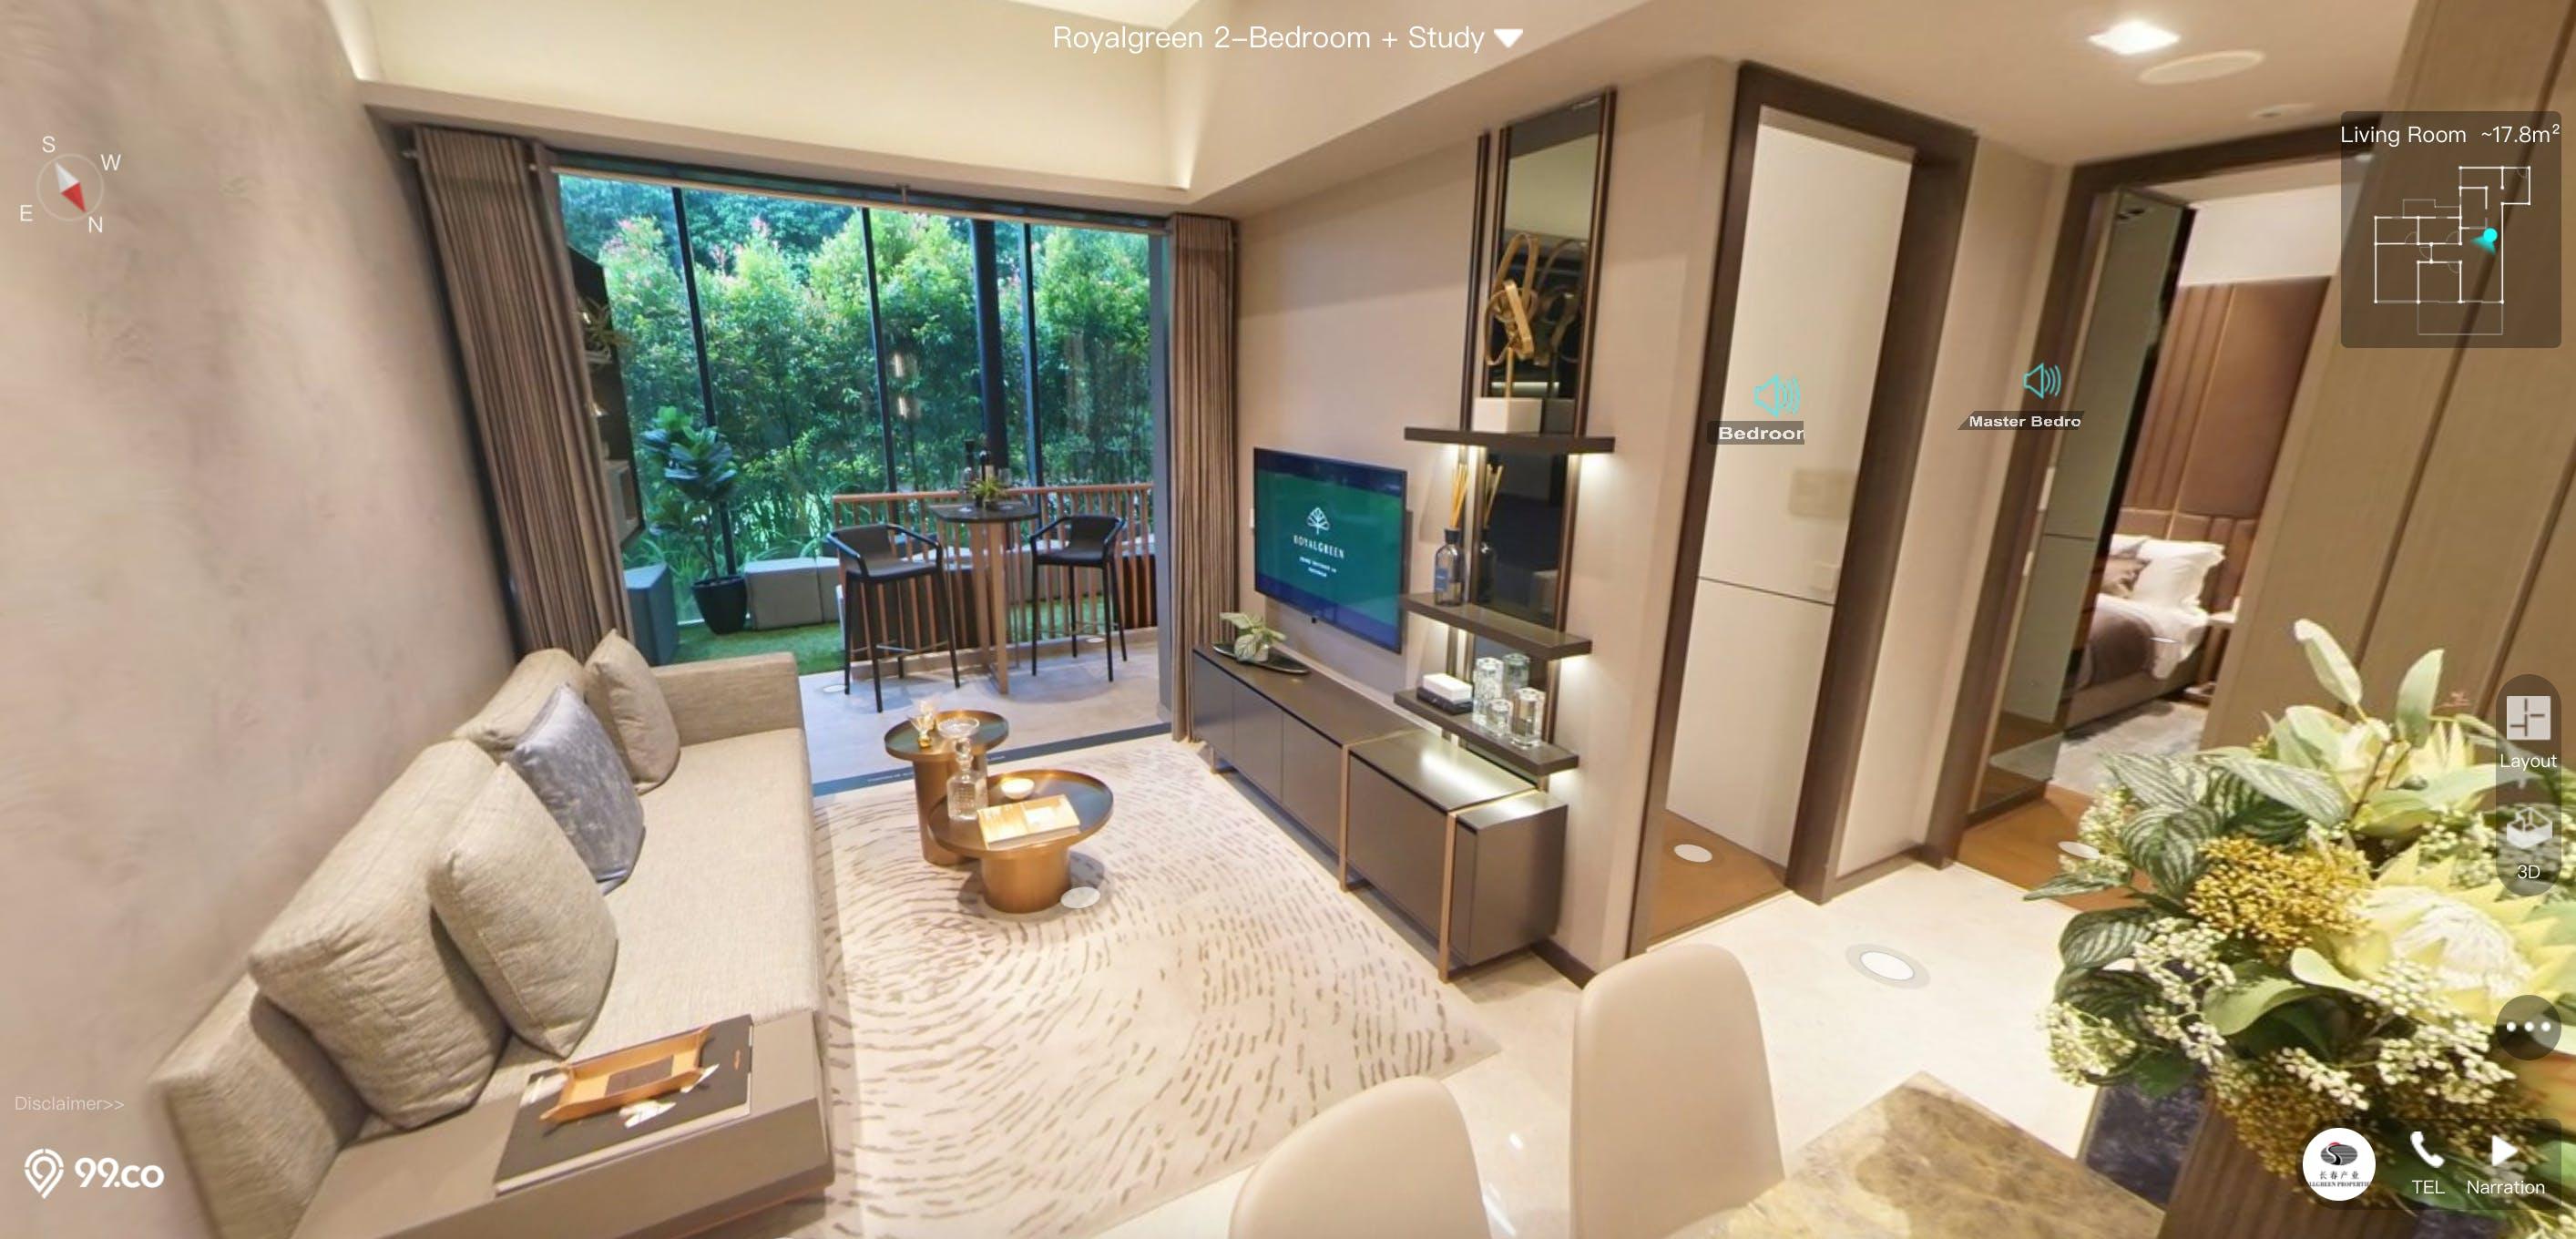 Royal Green 2 Bedroom + Study